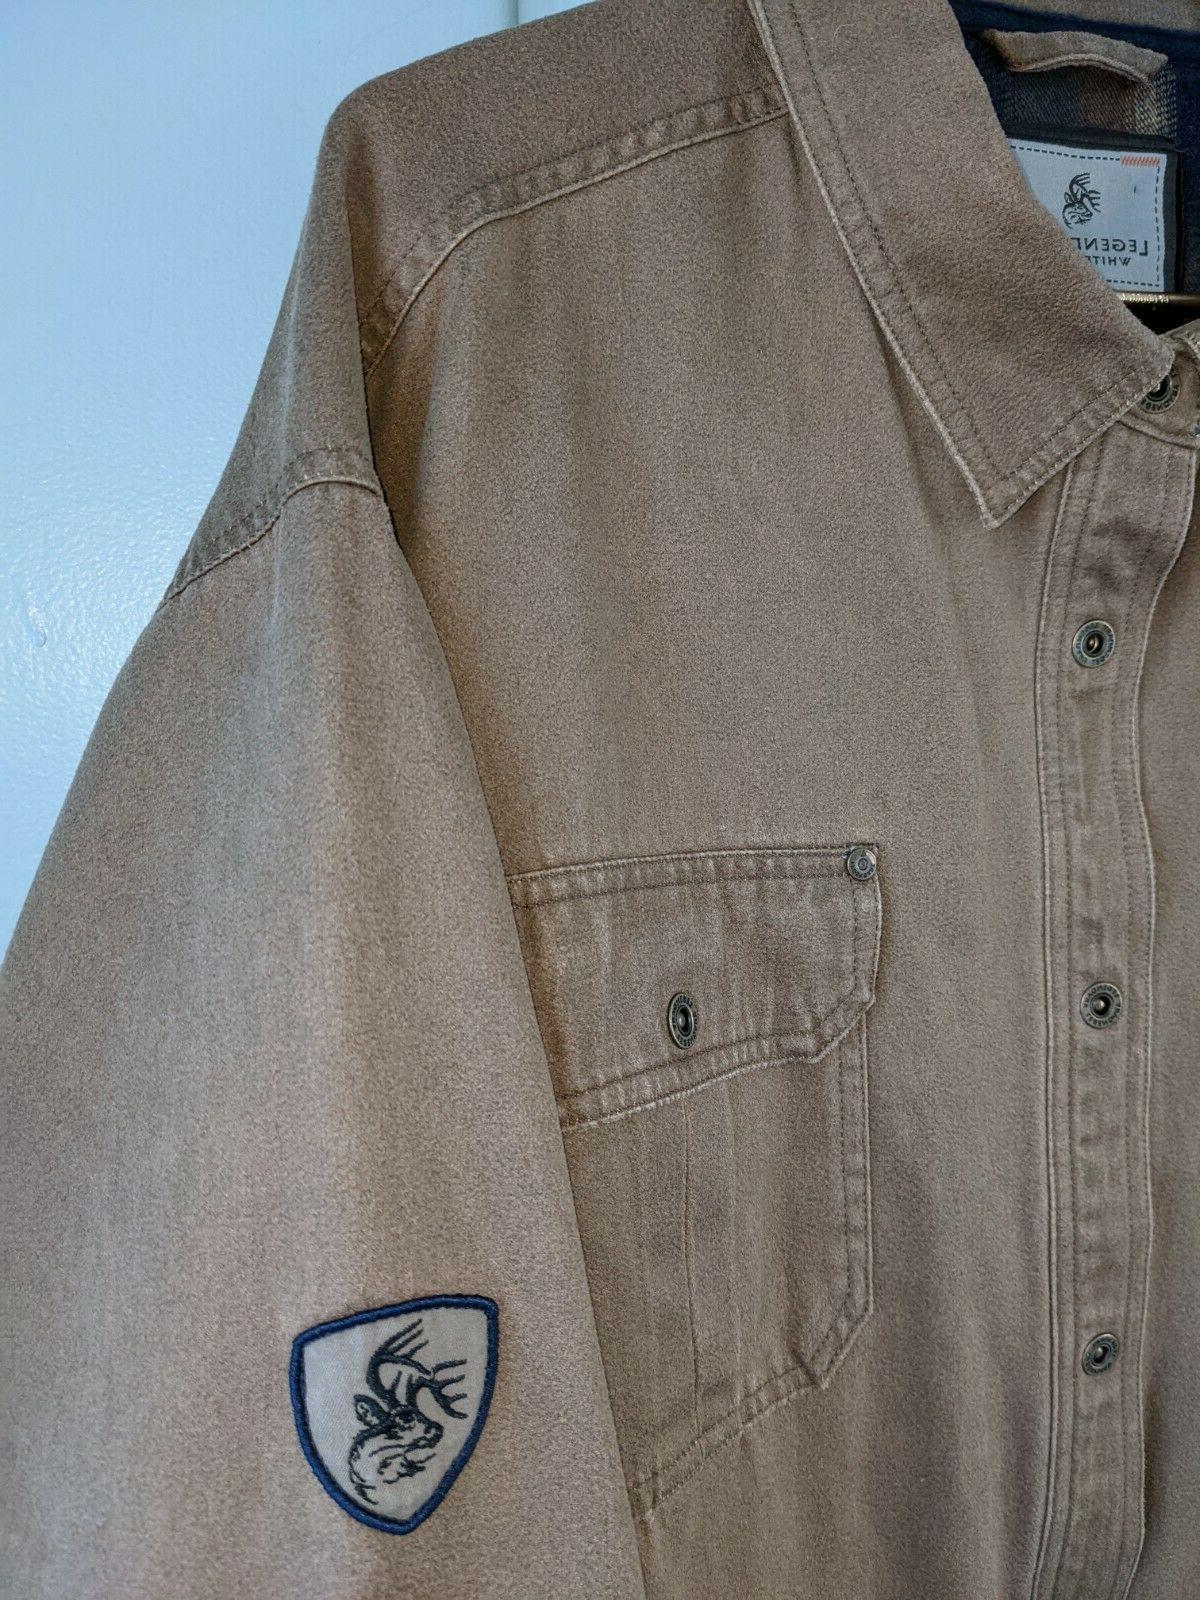 Legendary Journeyman Shirt Flannel Lined